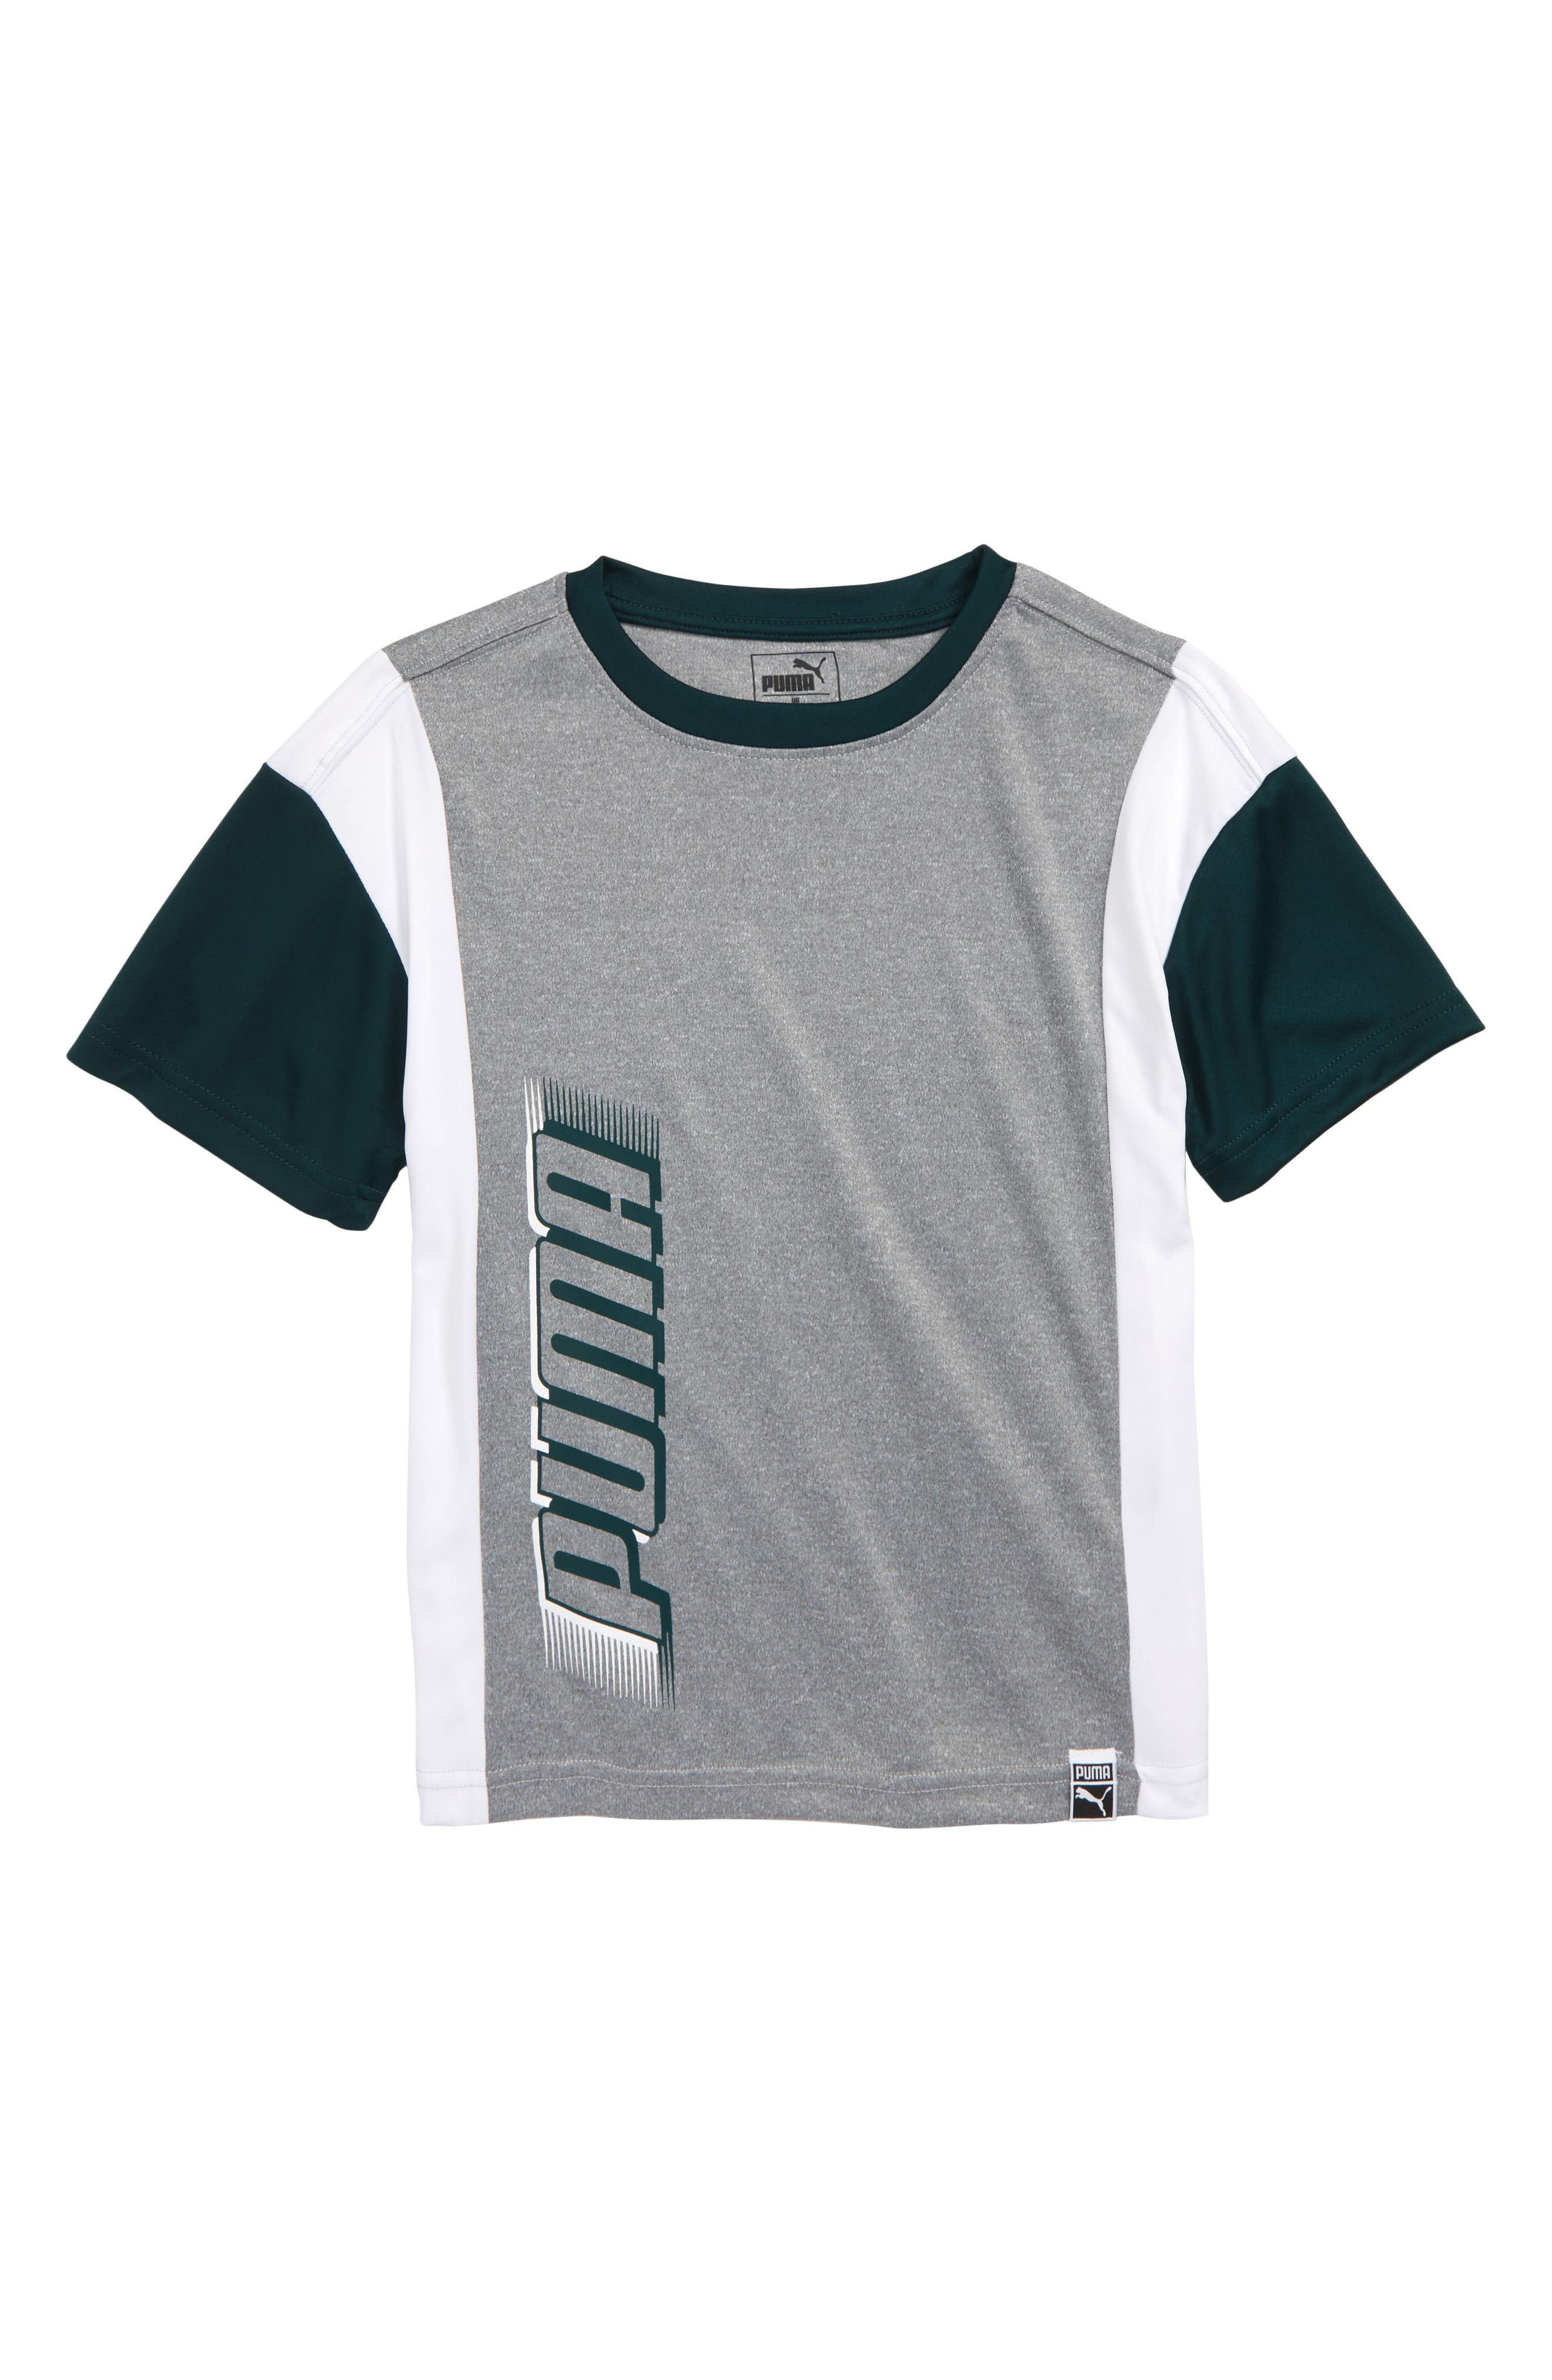 PUMA,                             Oversize T-Shirt,                             Main thumbnail 1, color,                             020